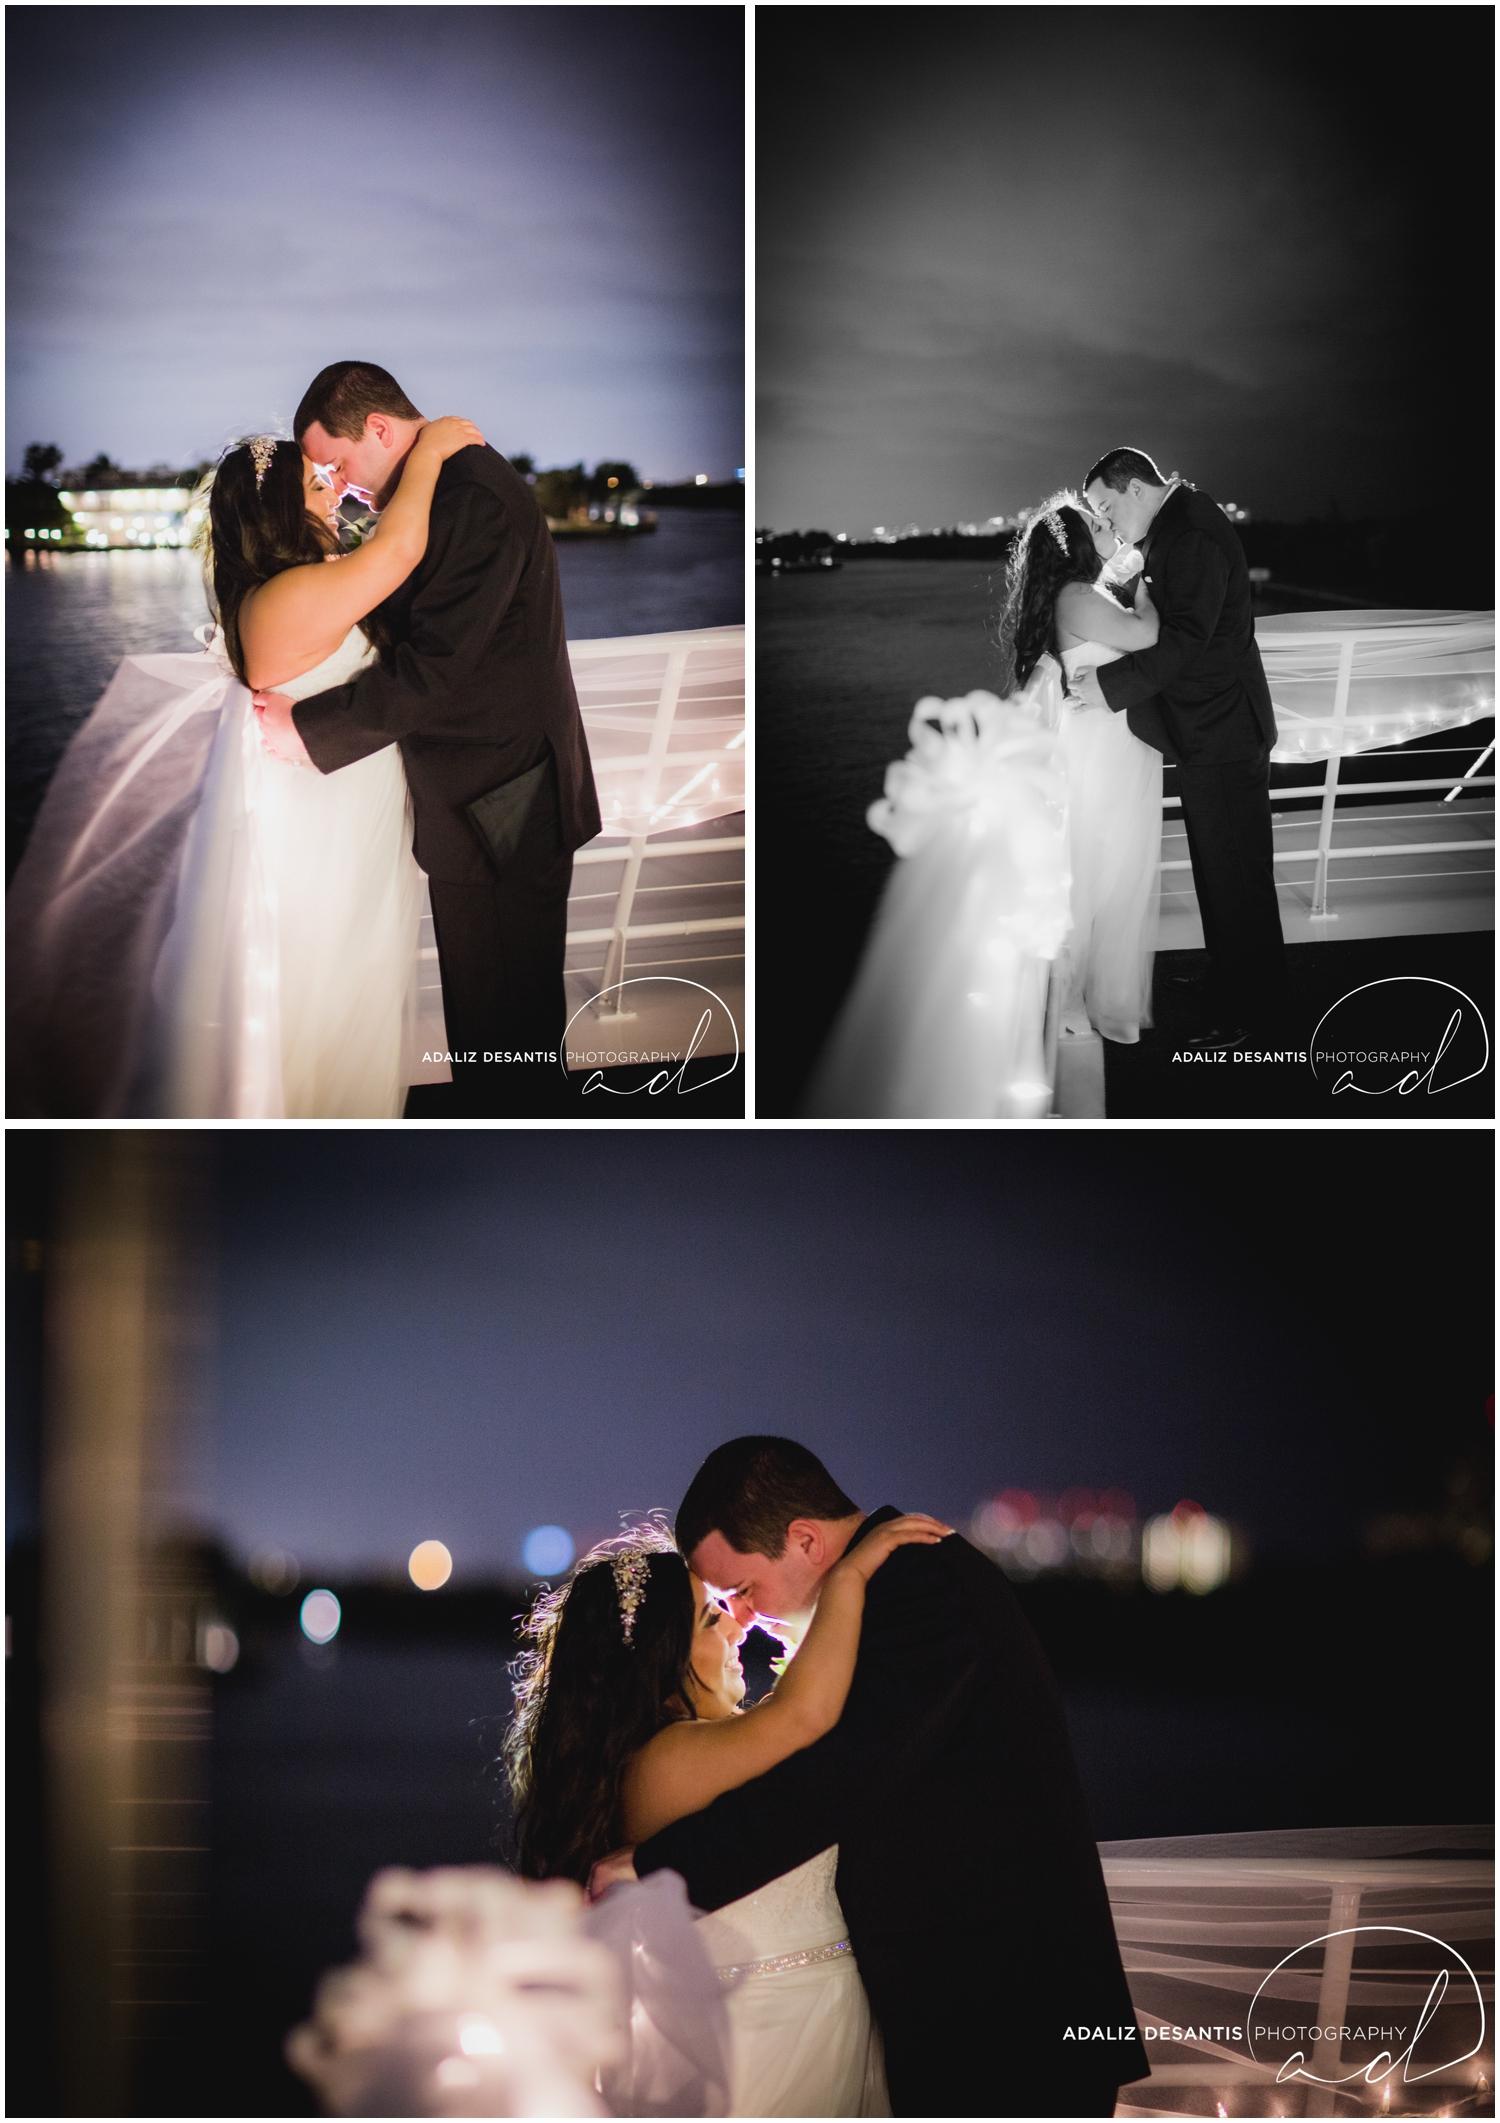 Taylor and amanda Indiana Fort Lauderdale Sun Dream yacht charter wedding 24